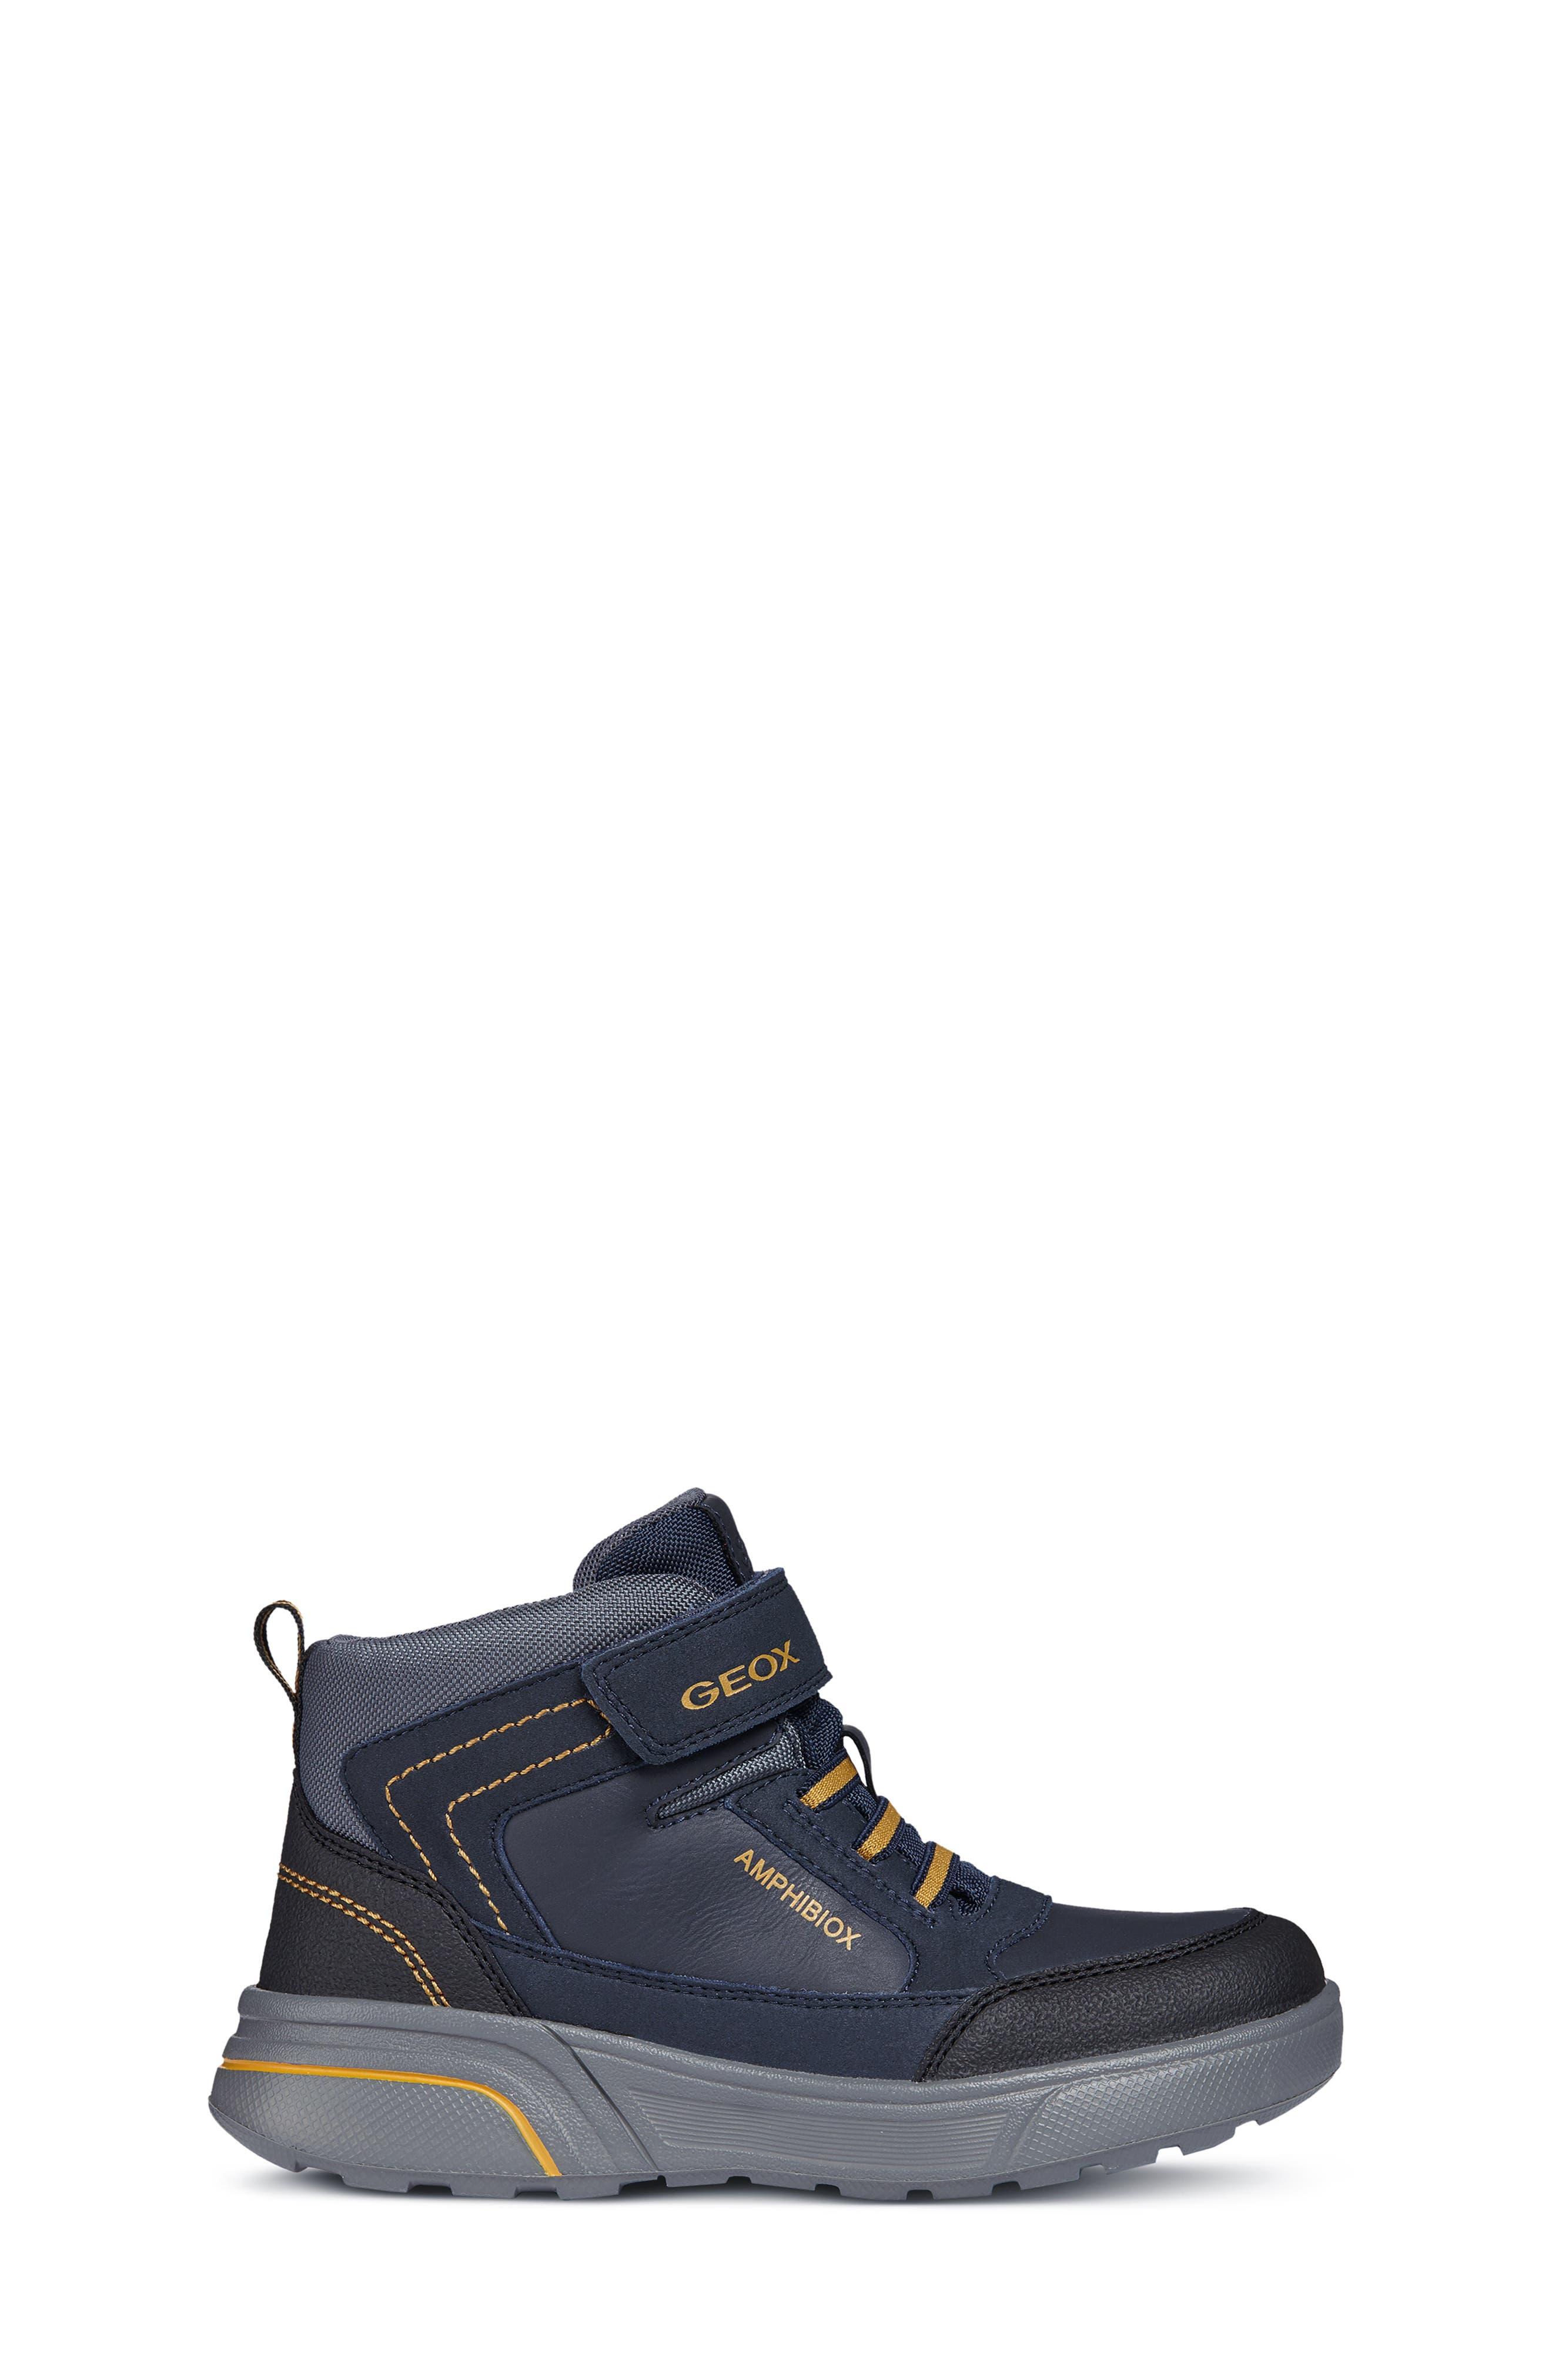 Sveggen ABX Waterproof Sneaker,                             Alternate thumbnail 3, color,                             NAVY/YELLOW